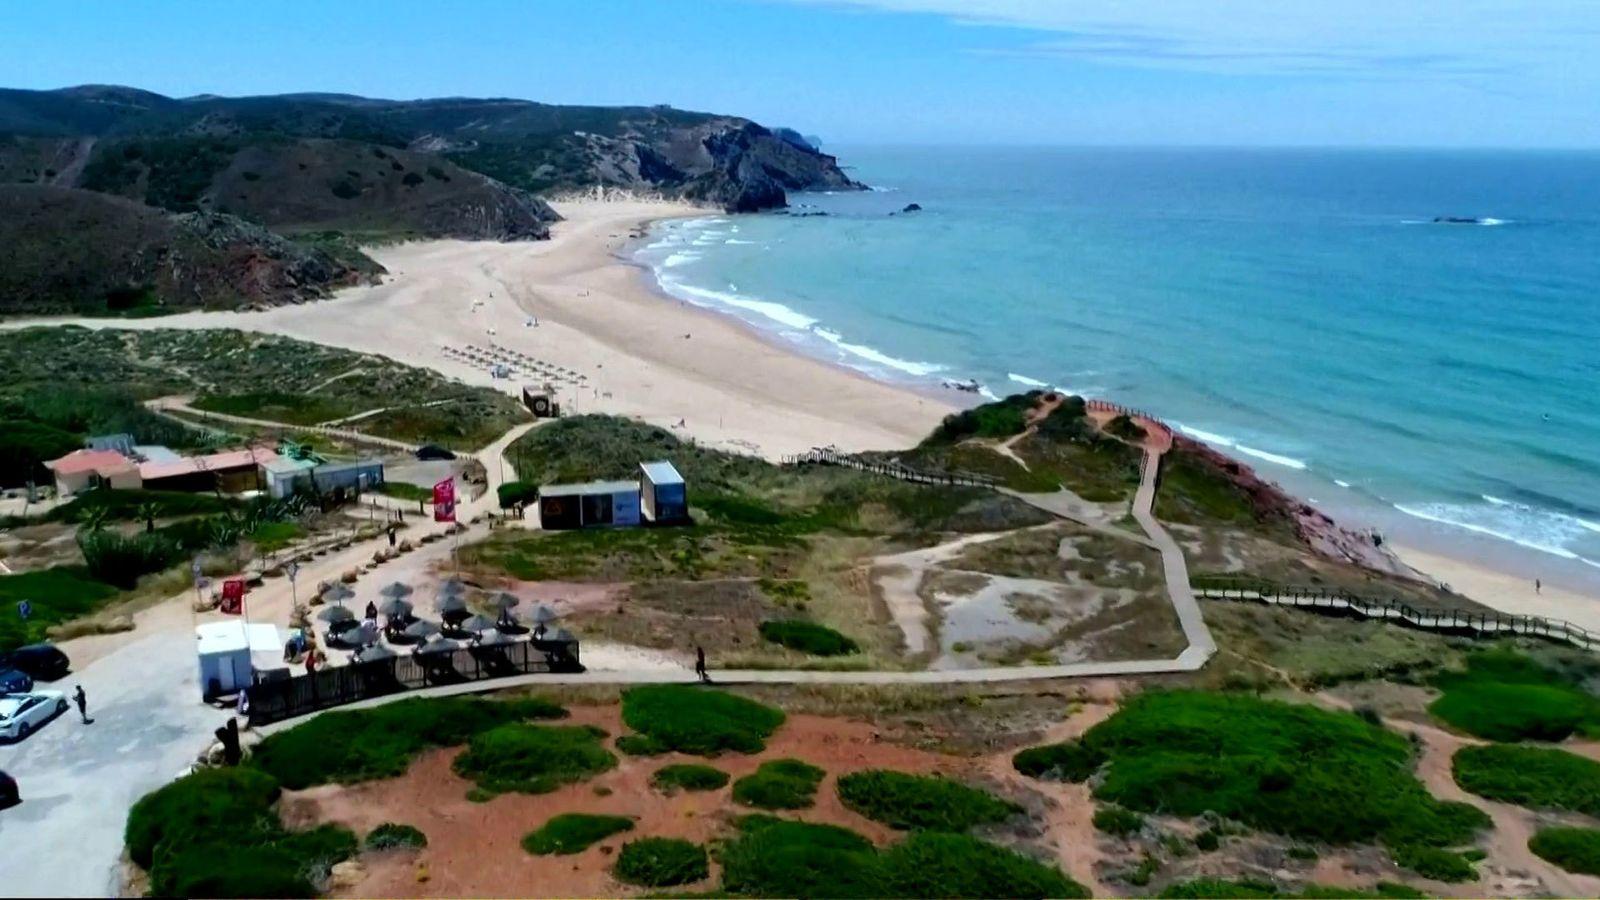 Coronavirus: Portugal in talks with UK over travel quarantine exemption | Politics News